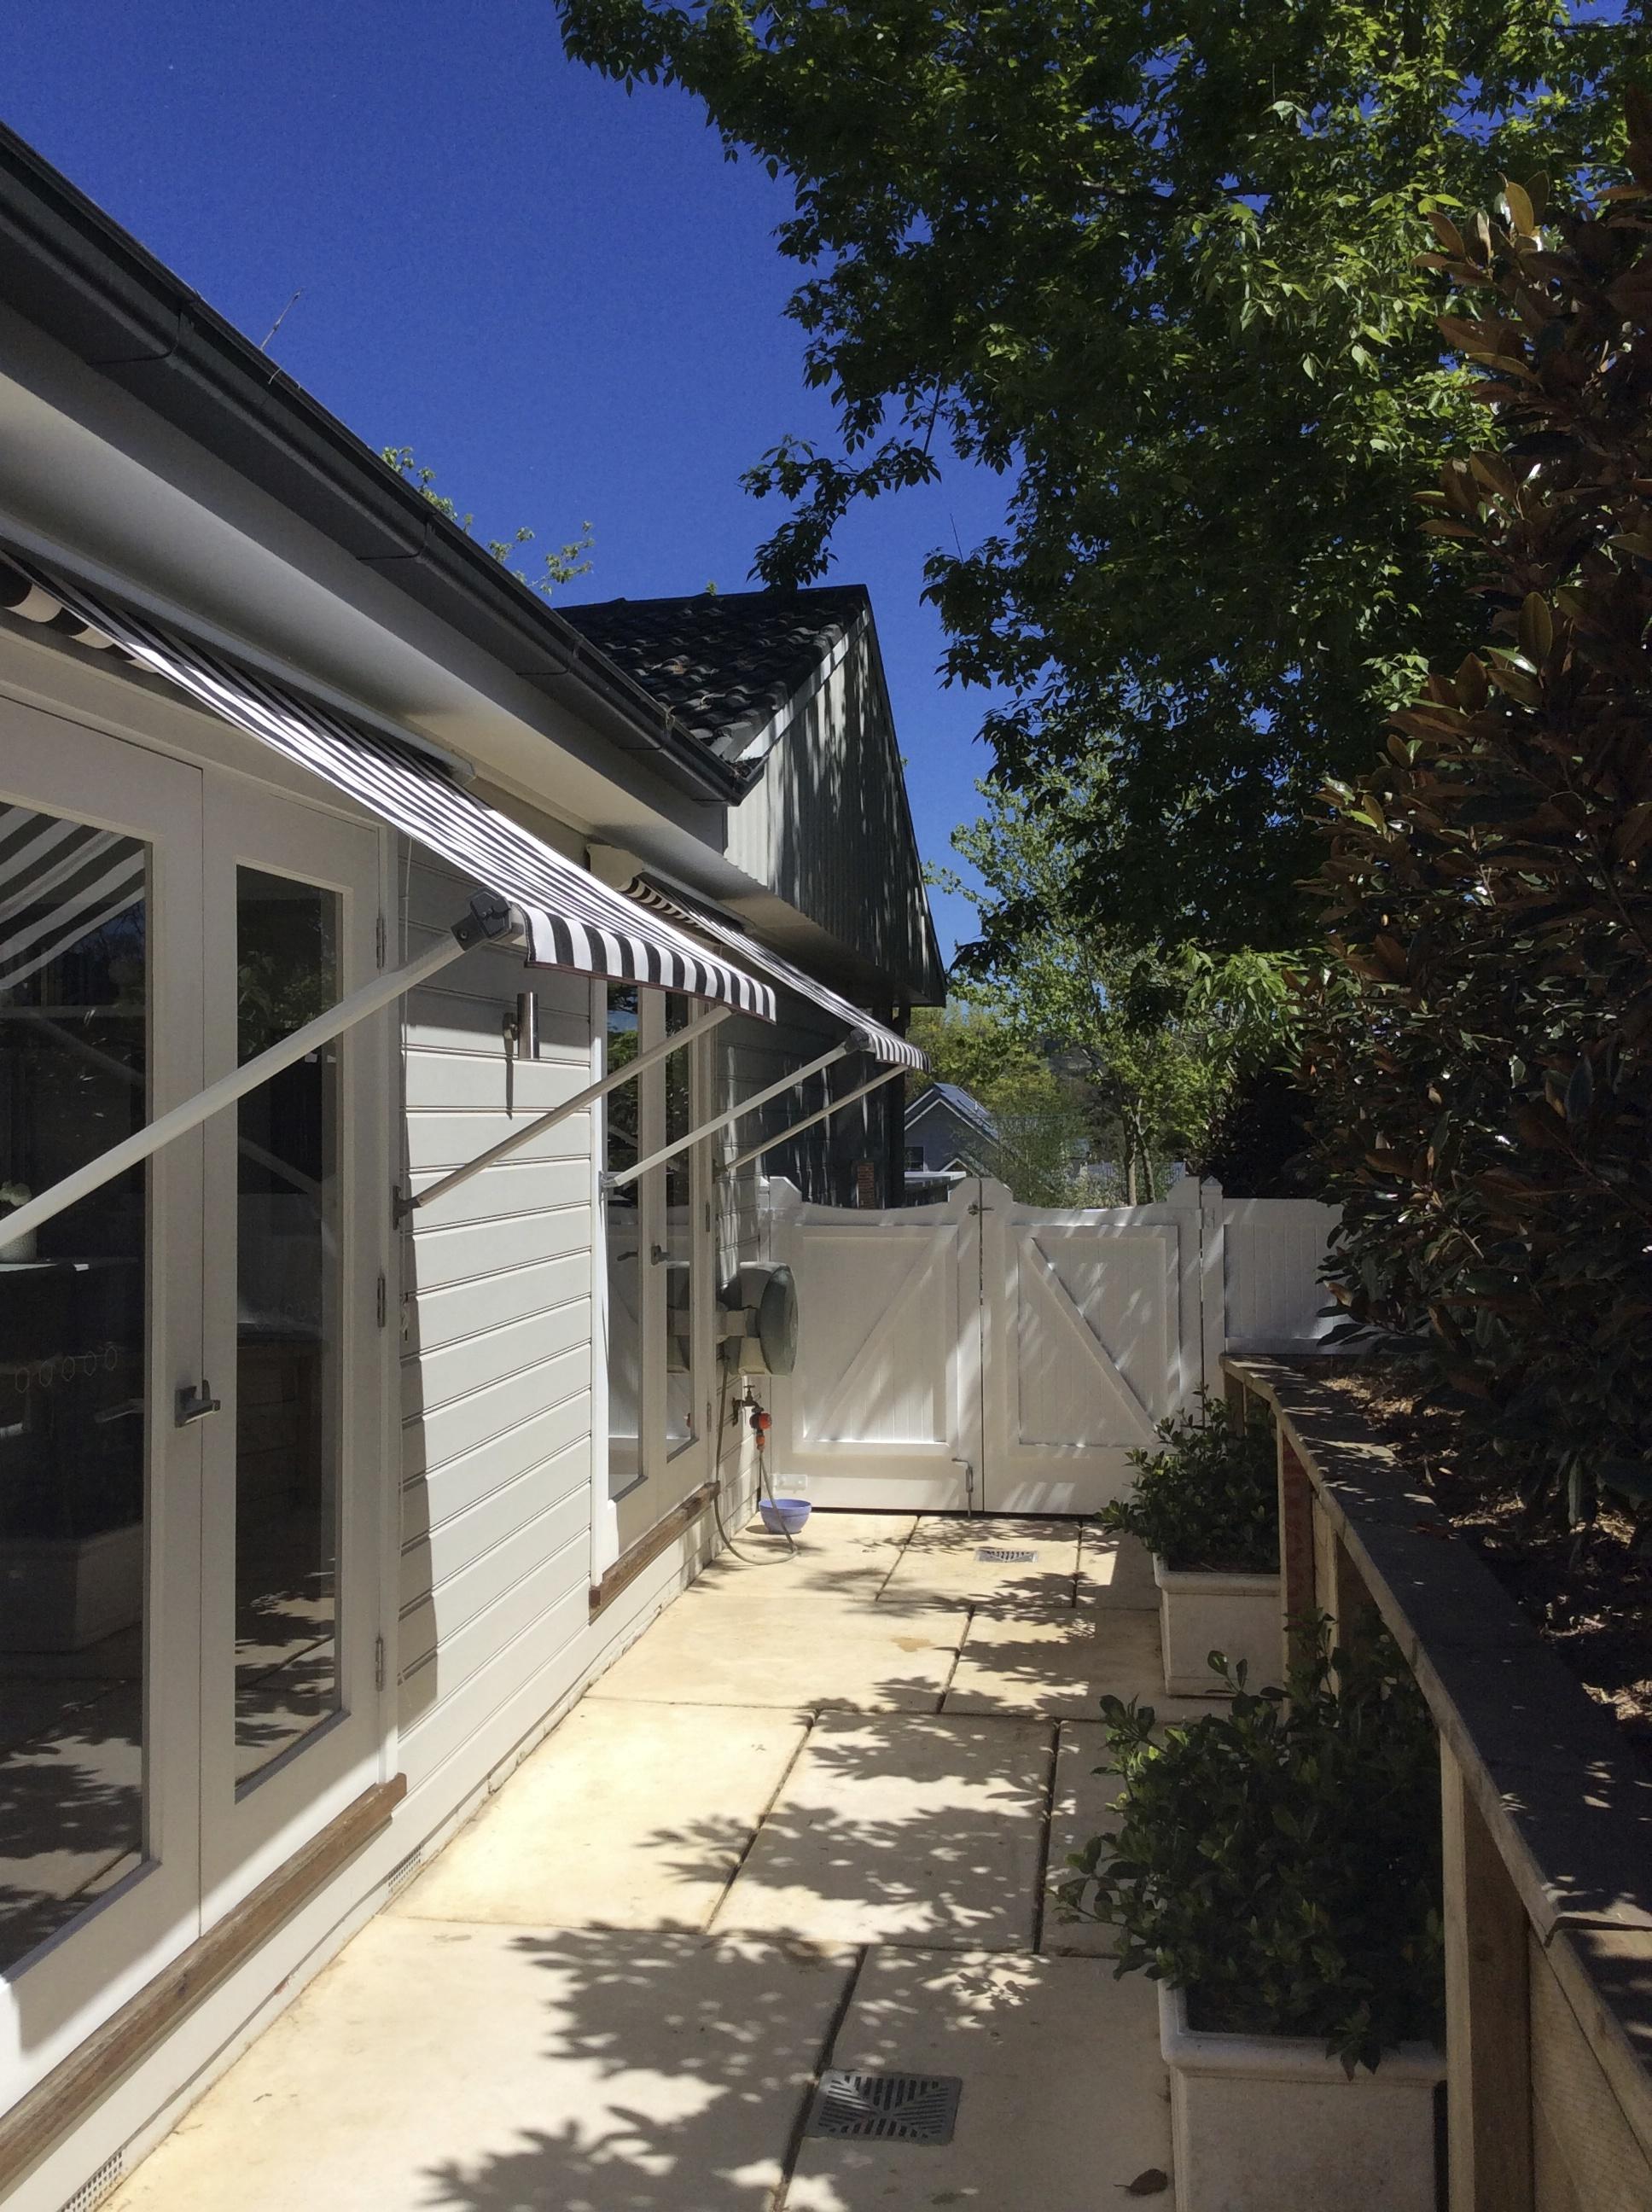 Andrew_Economos_Custom_Builder_Bowral_NSW_Australia_Cottage_18.jpg